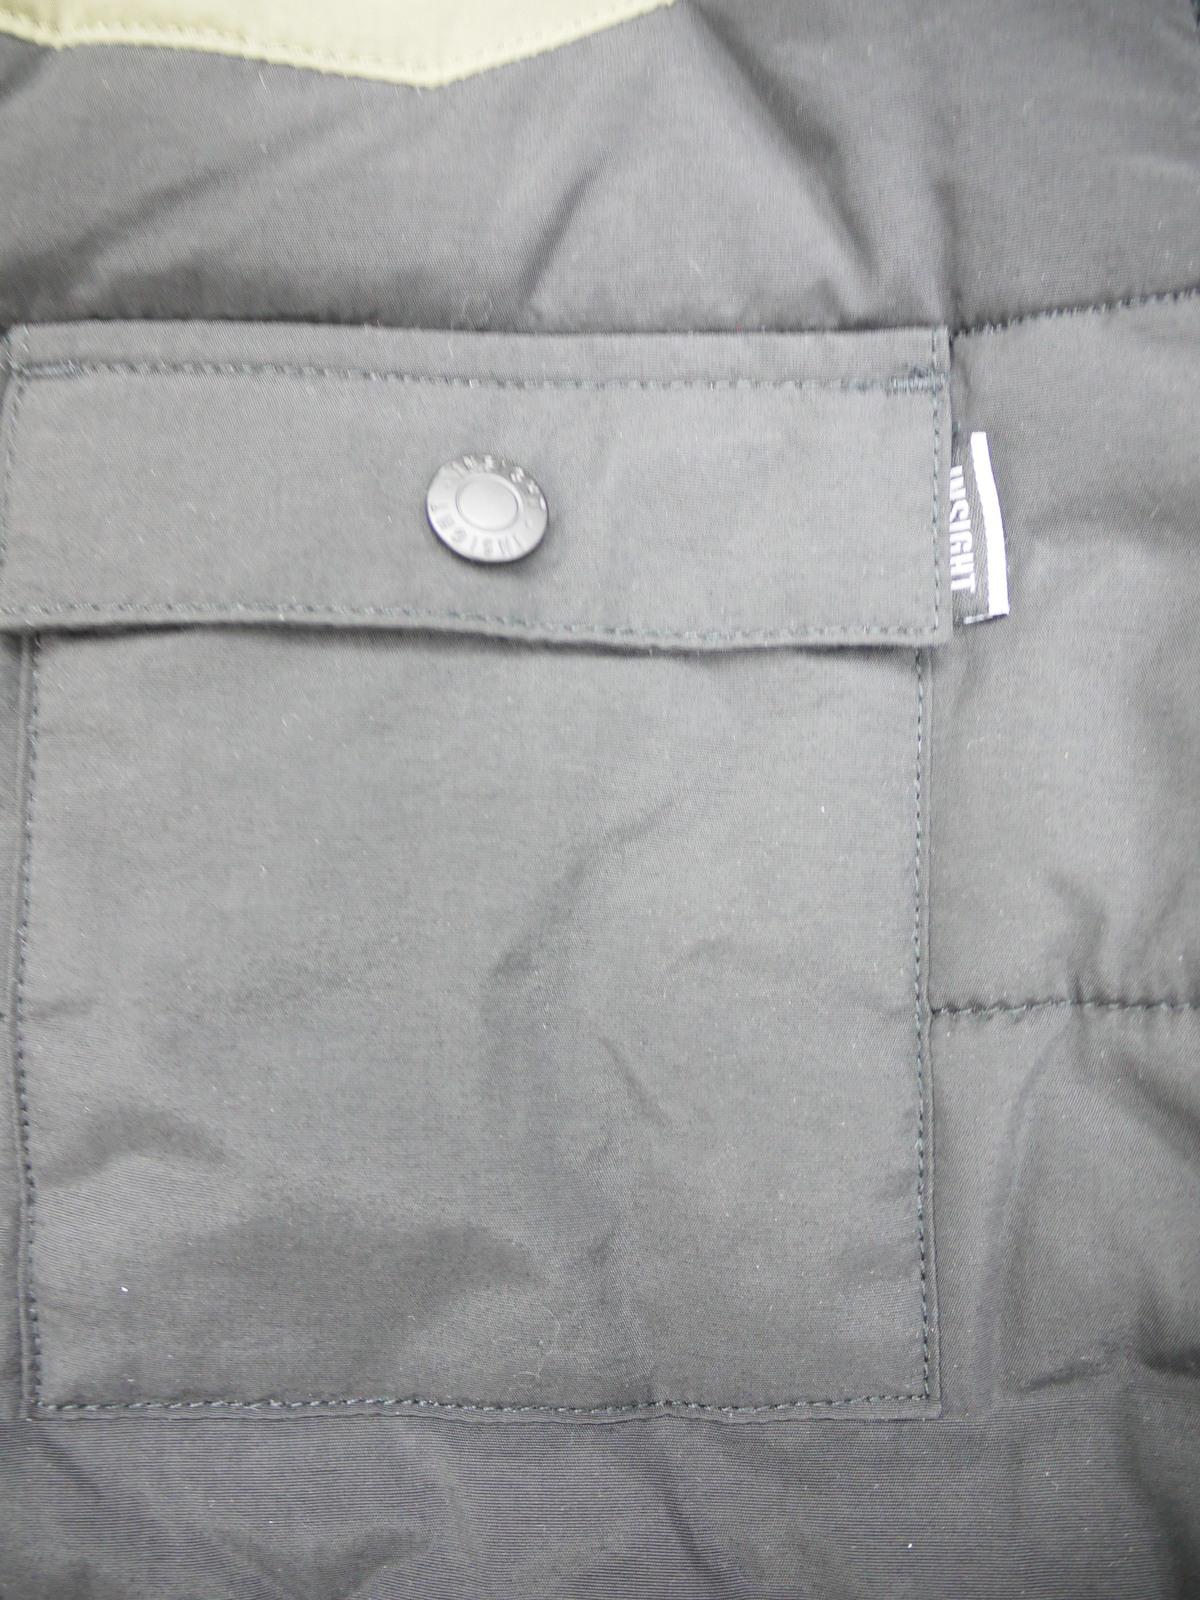 I5PCBKMM35 insight Heavyweight Puffer Black Coat Medium Size for Men